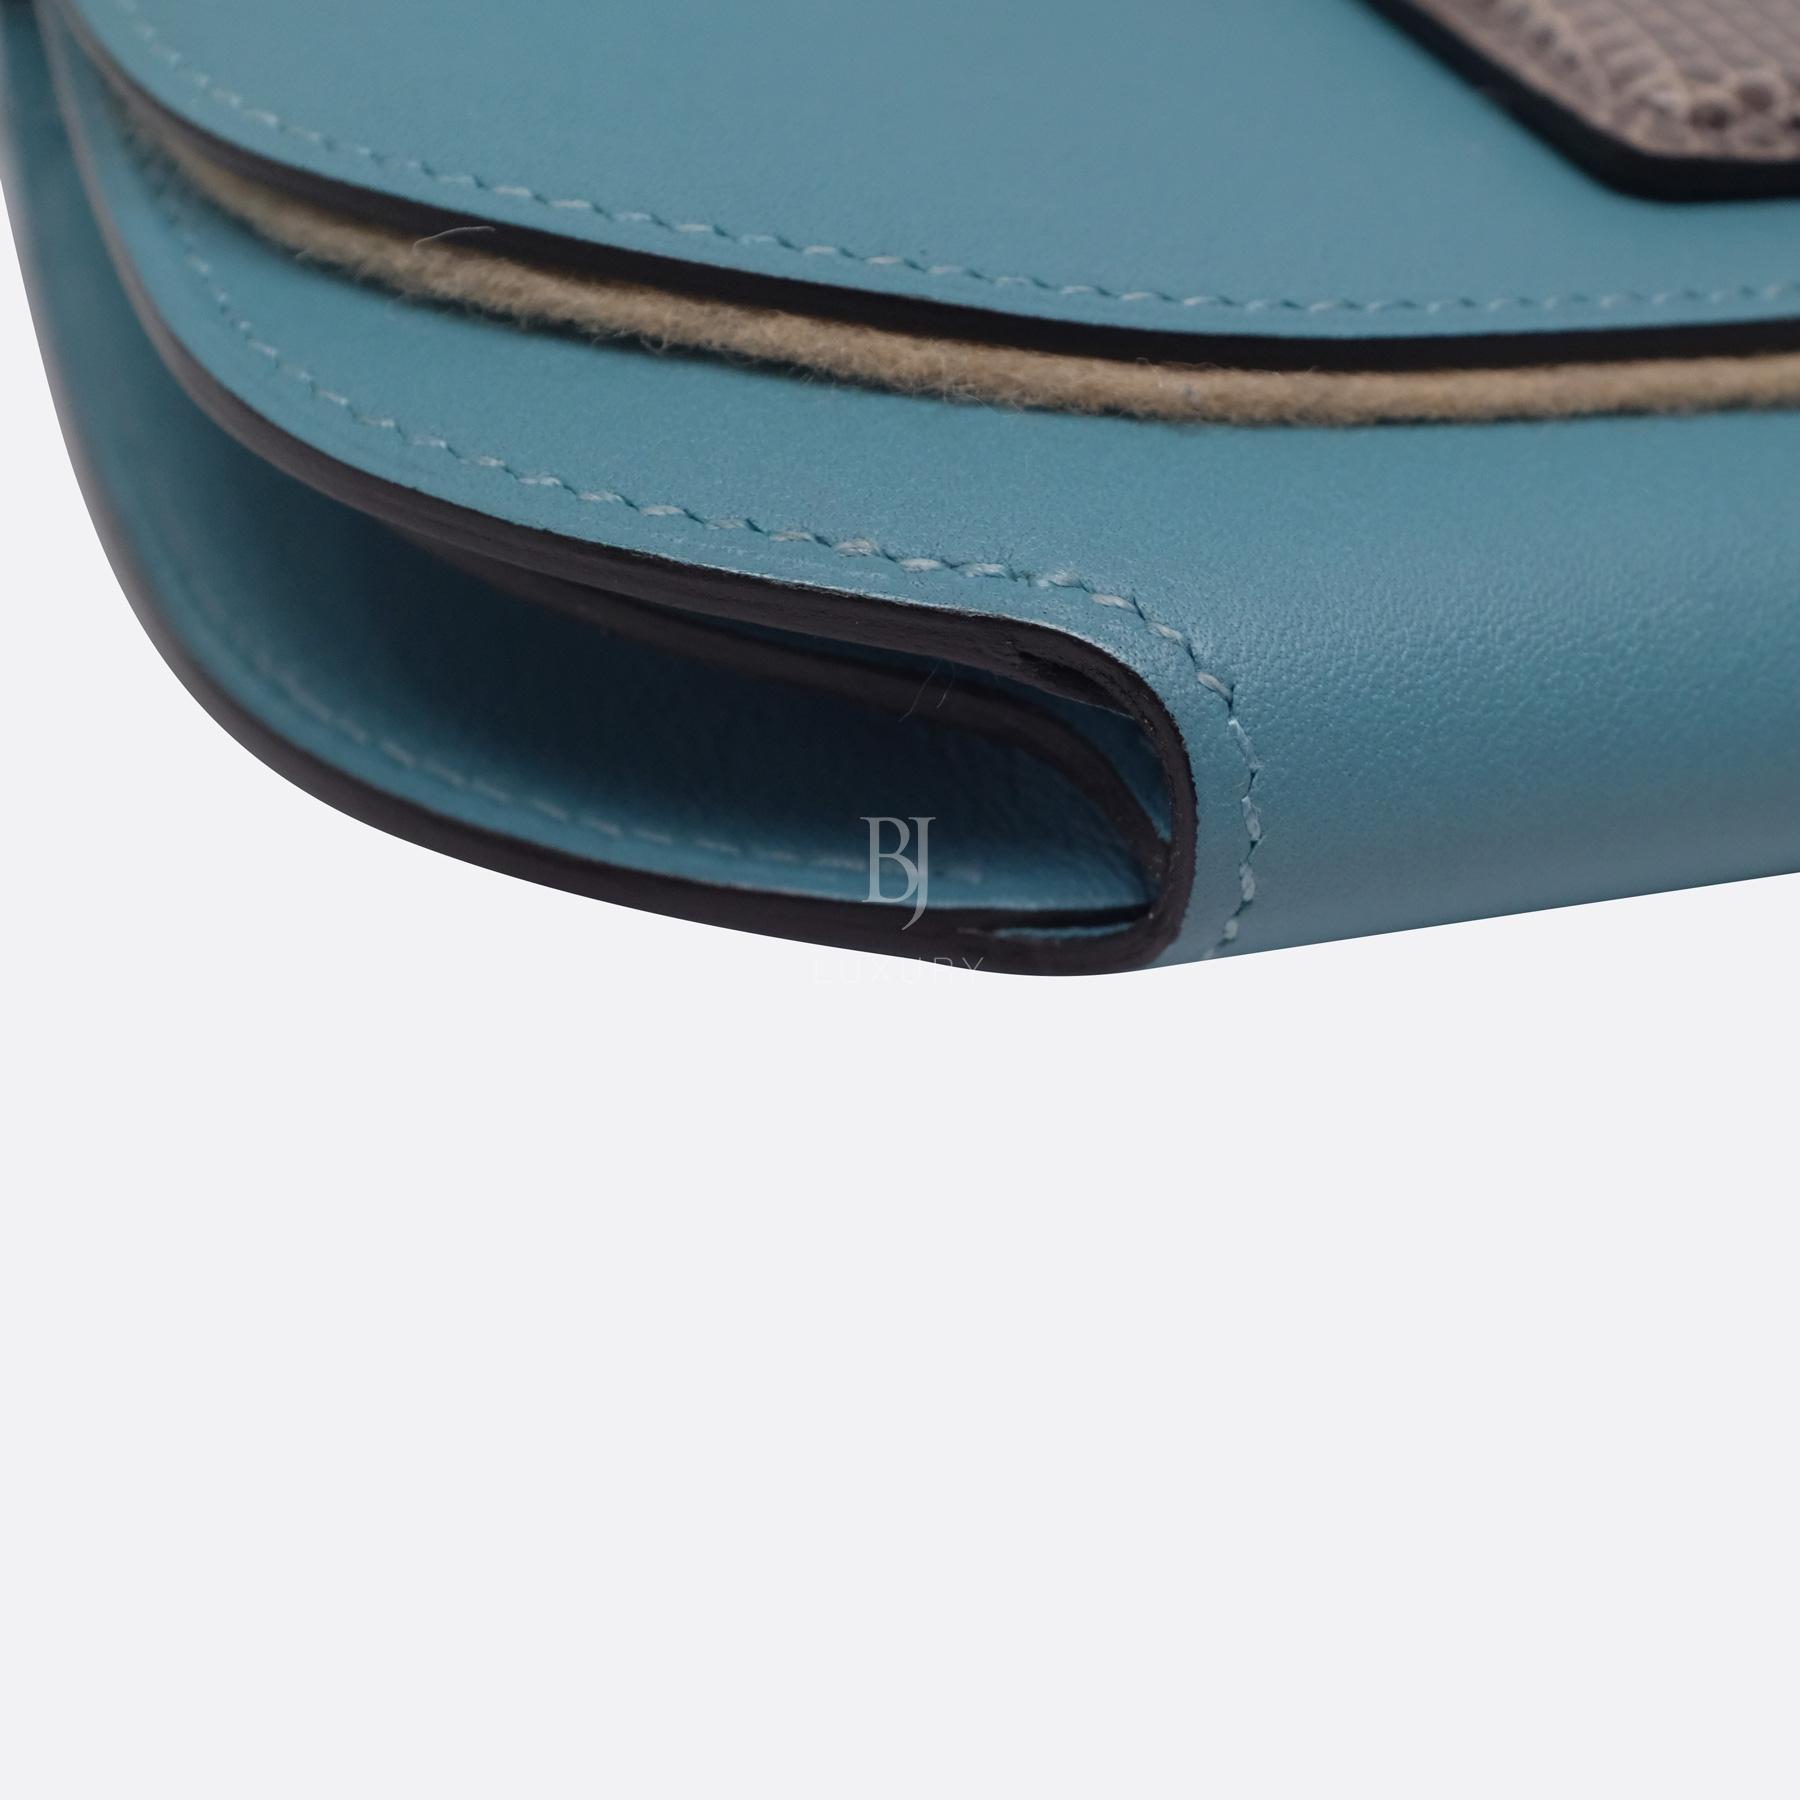 Hermes Conveyor Bag 16 Turquoise Swift Lizard Palladium BJ Luxury 8.jpg